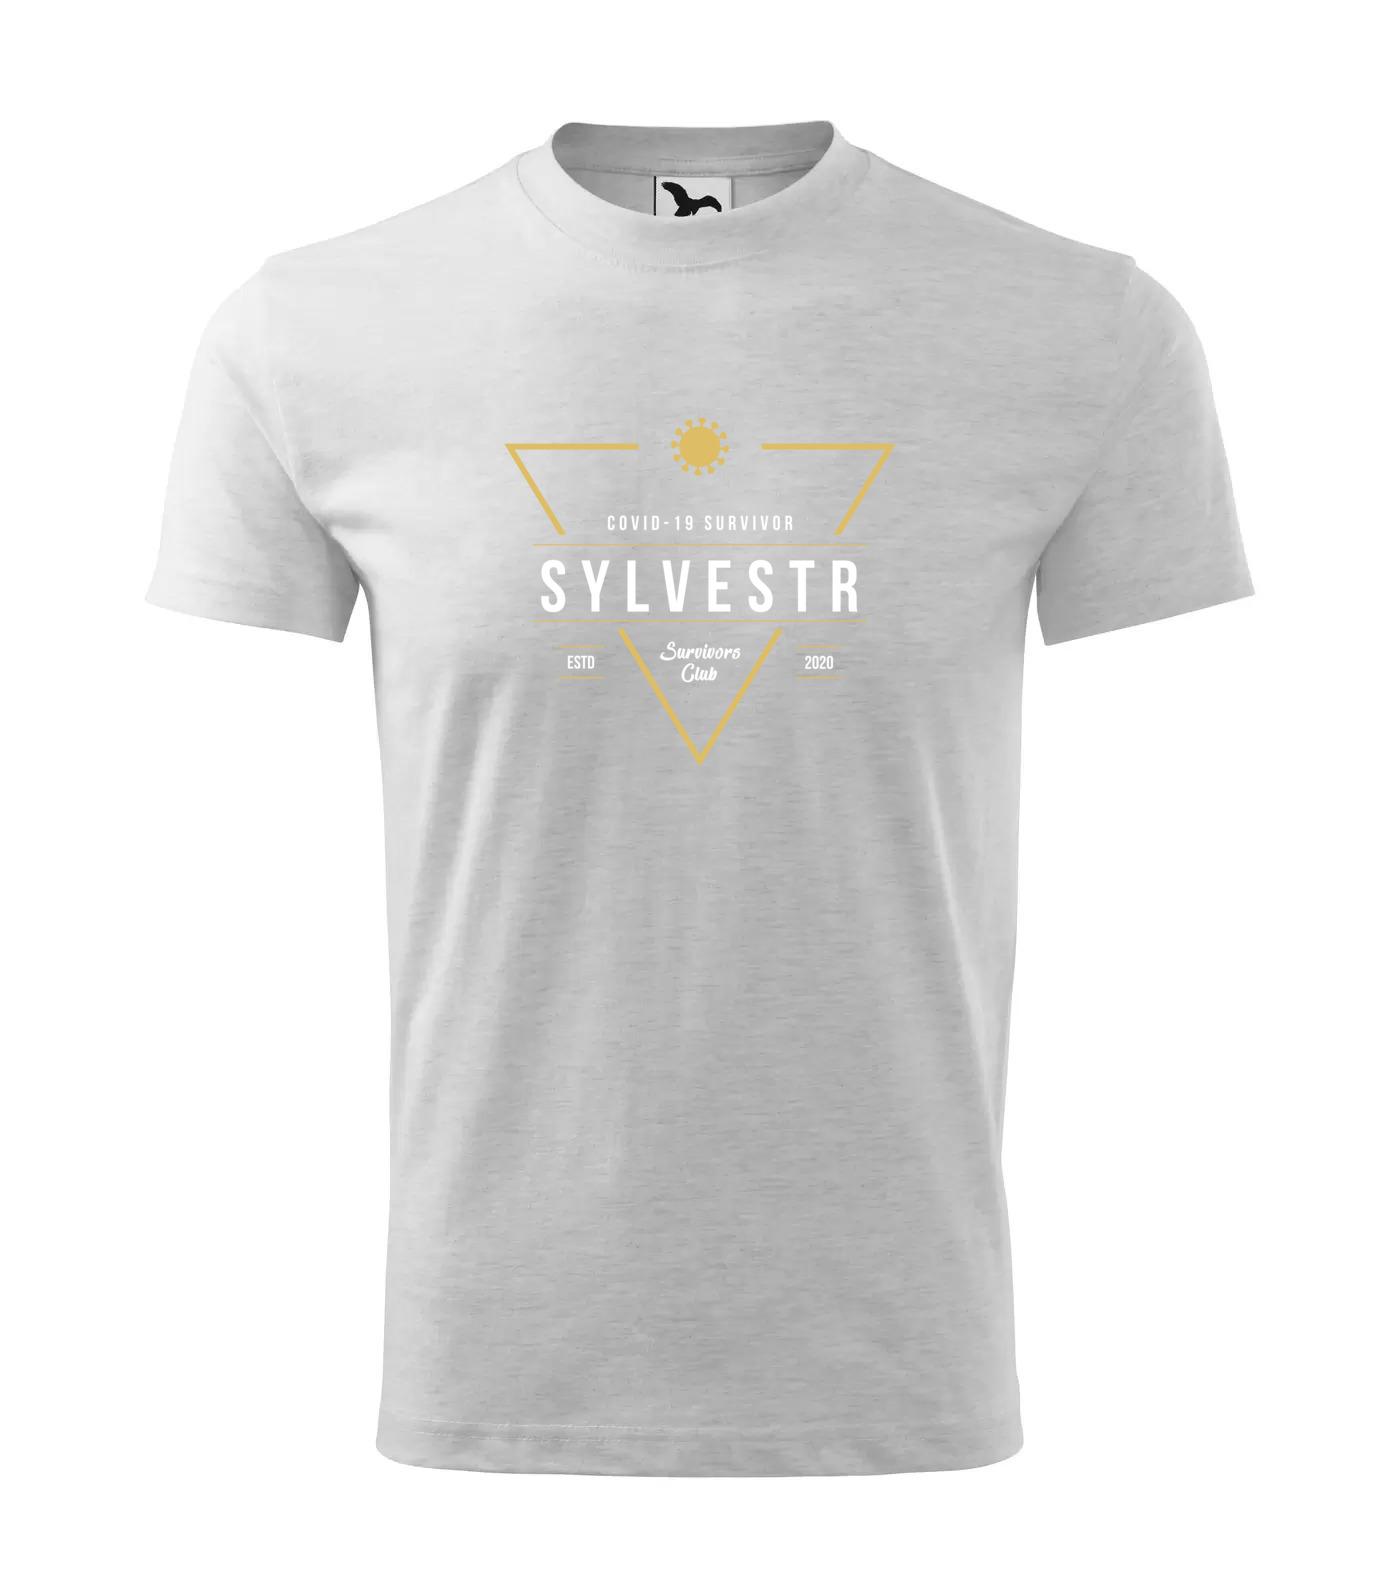 Tričko Survivor Club Sylvestr